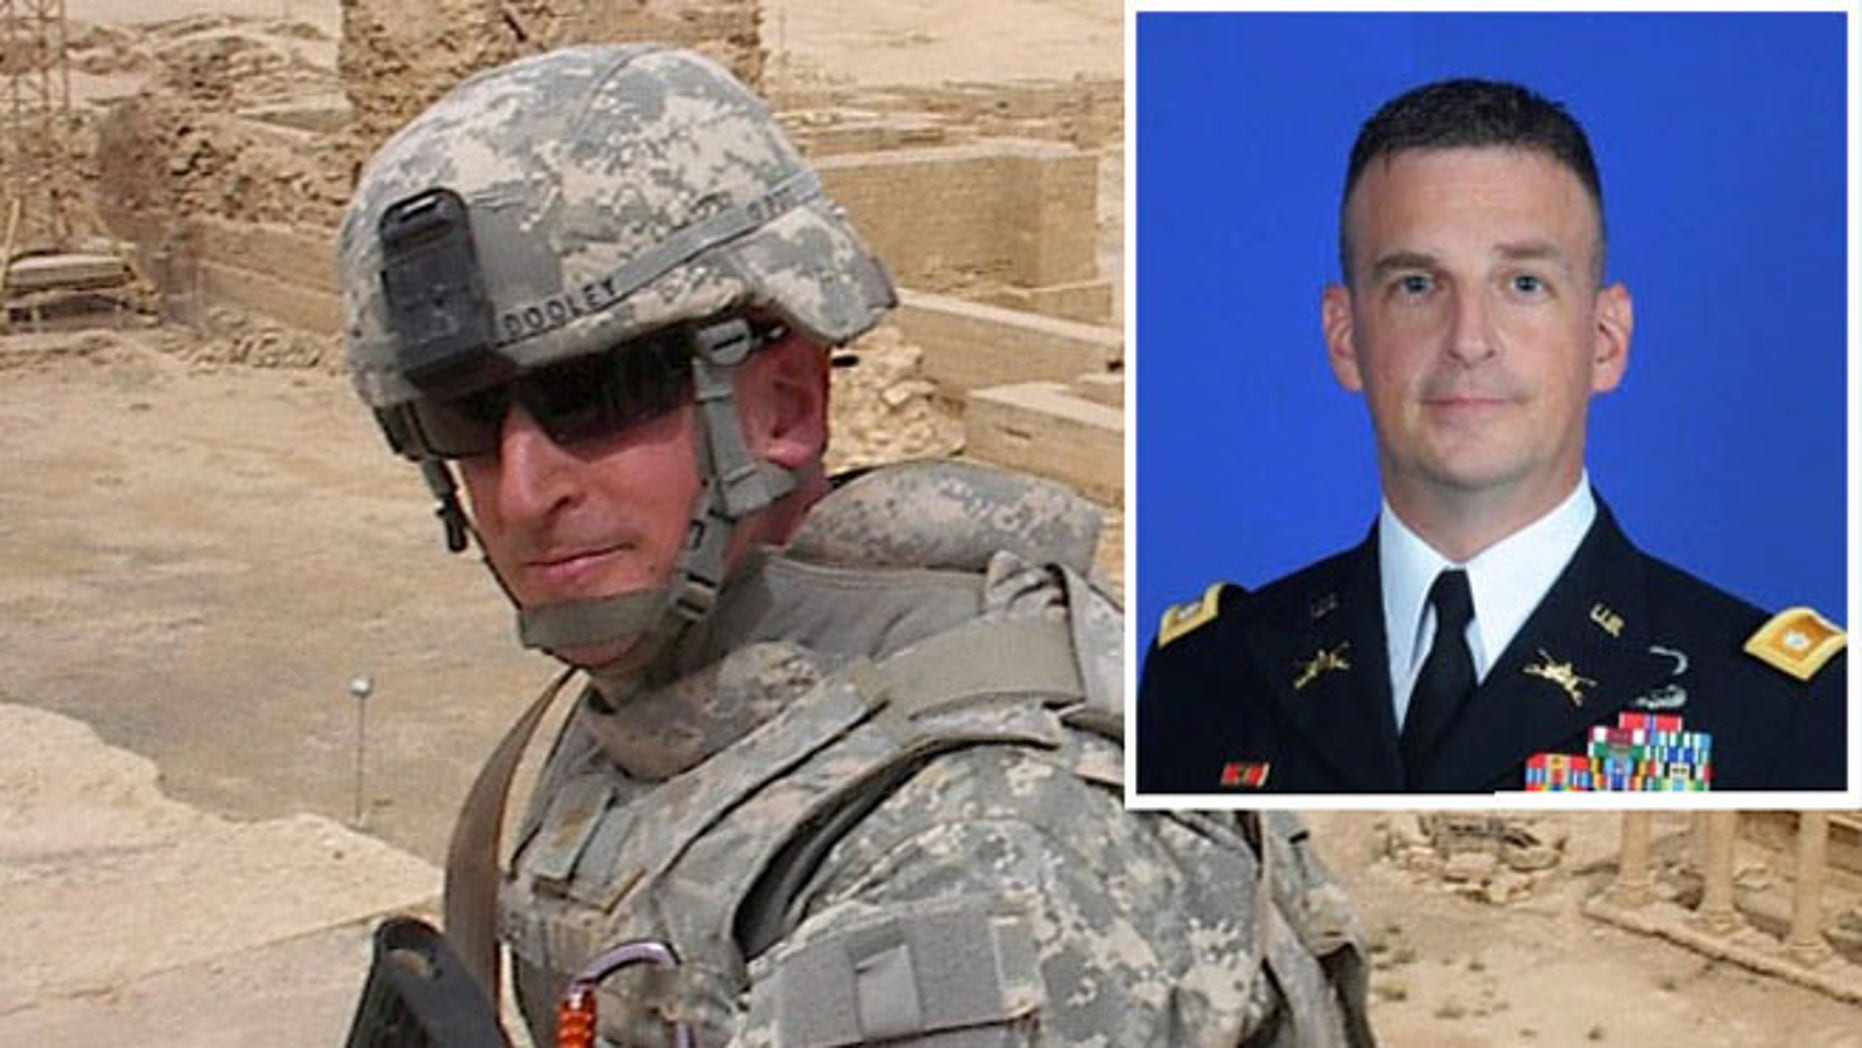 U.S. Army LTC. Matthew Dooley